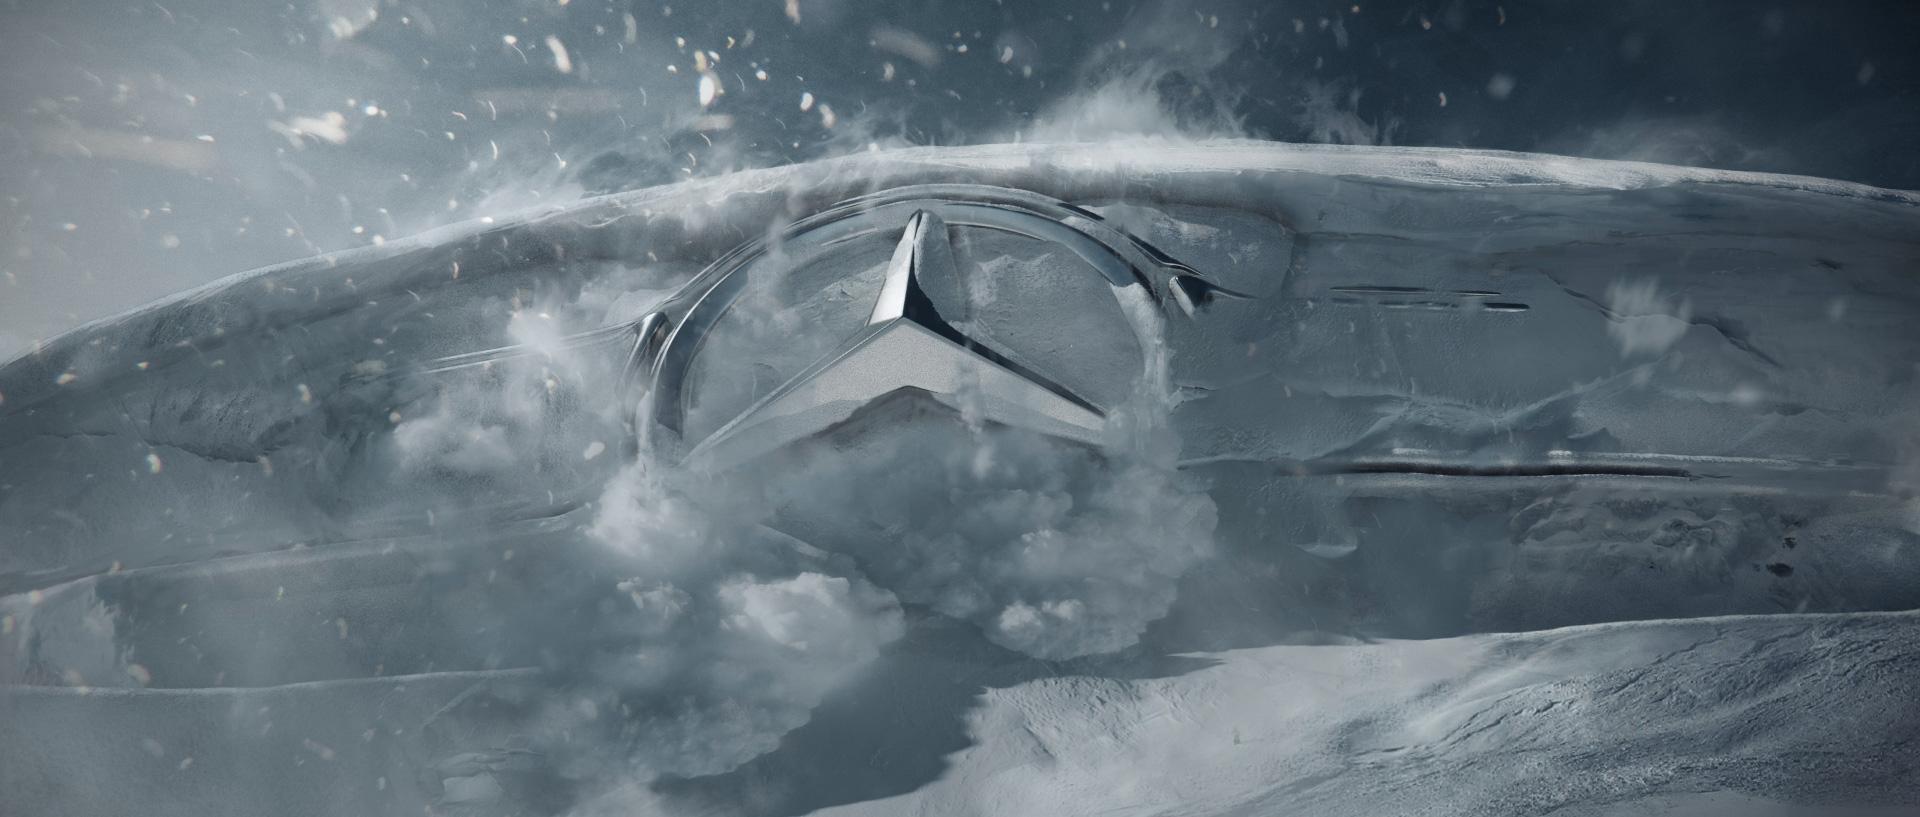 snow_styleframe2_cc